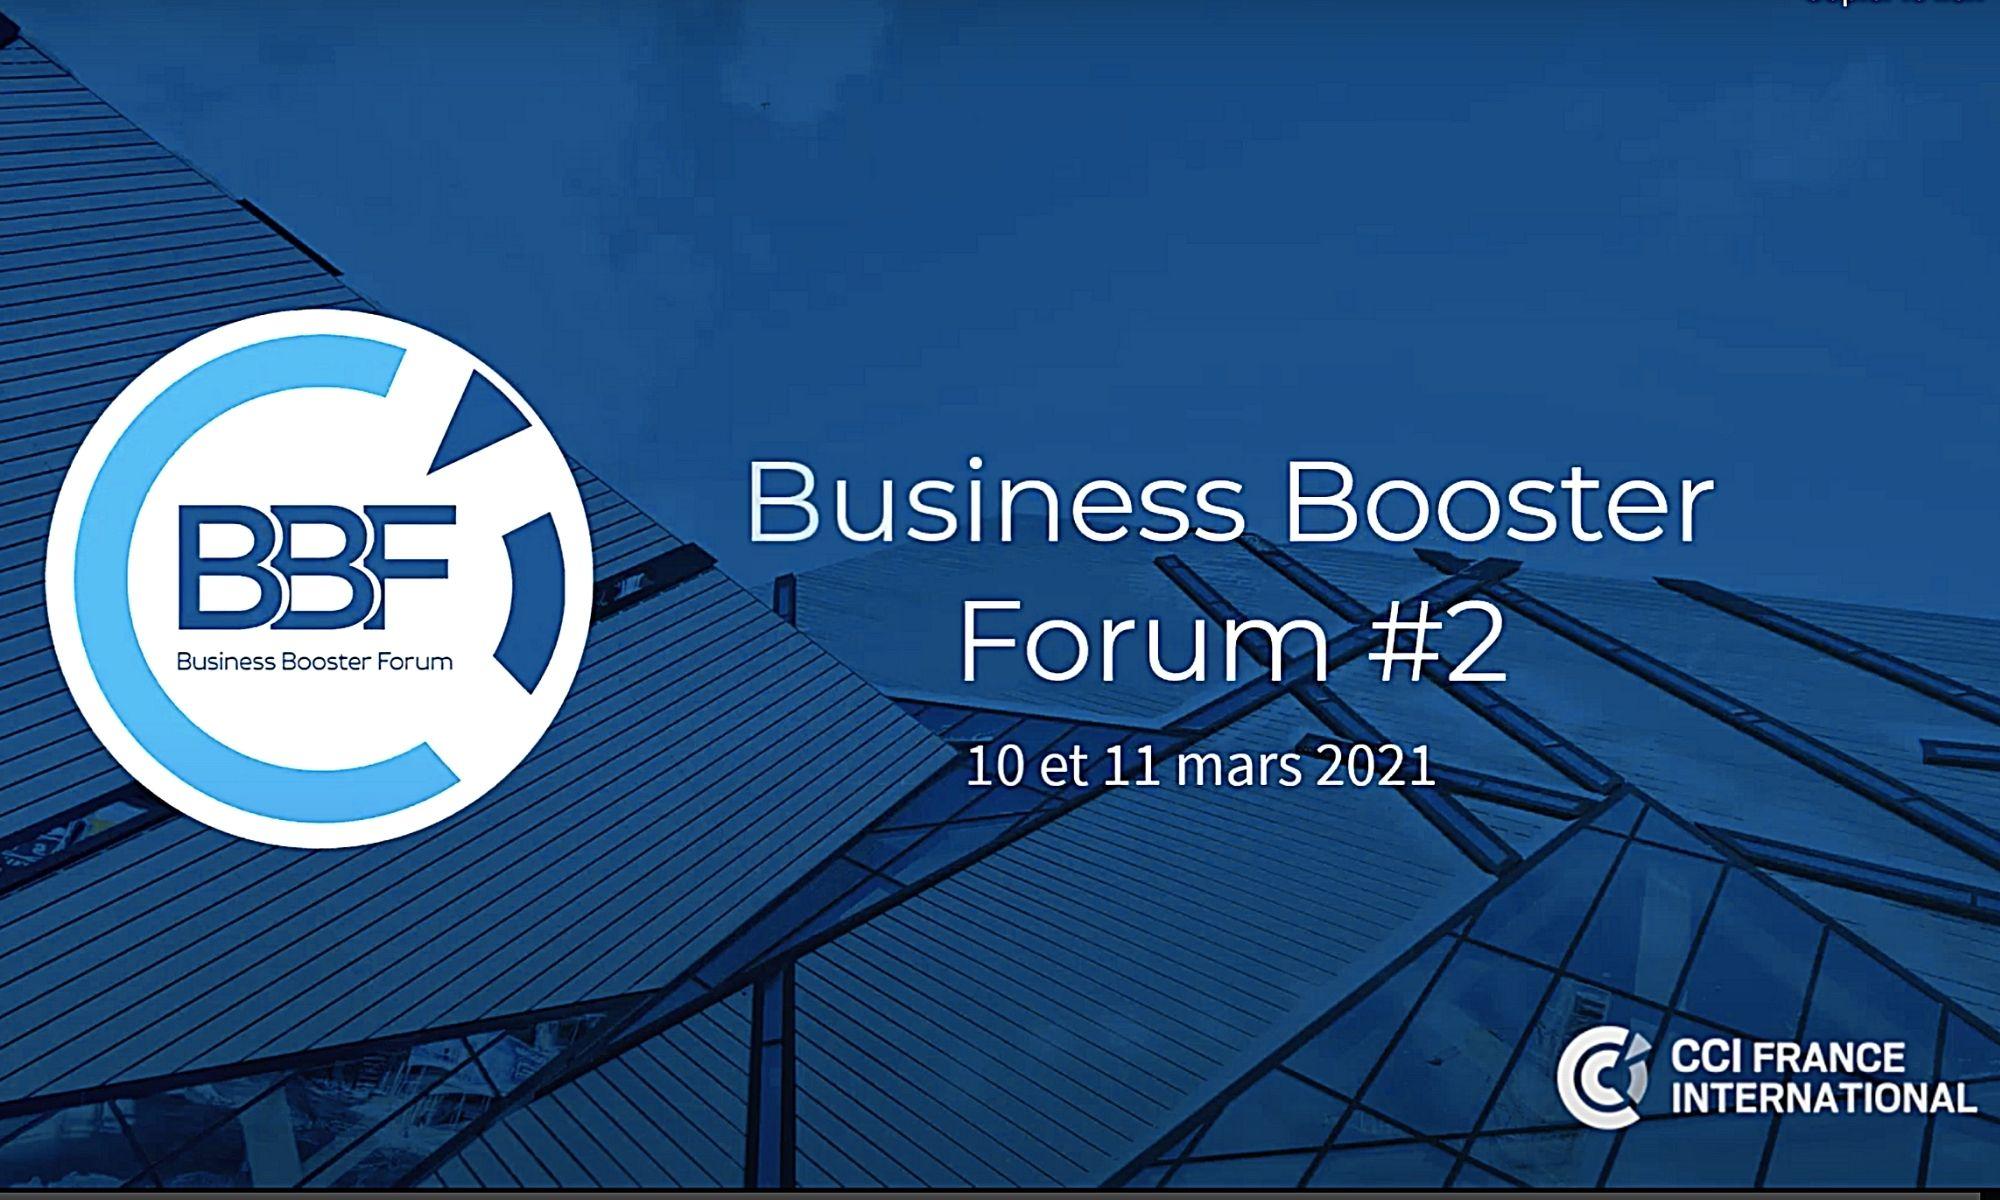 CCI France International : 35 webinaires du Booster Forum #2 disponibles en replay